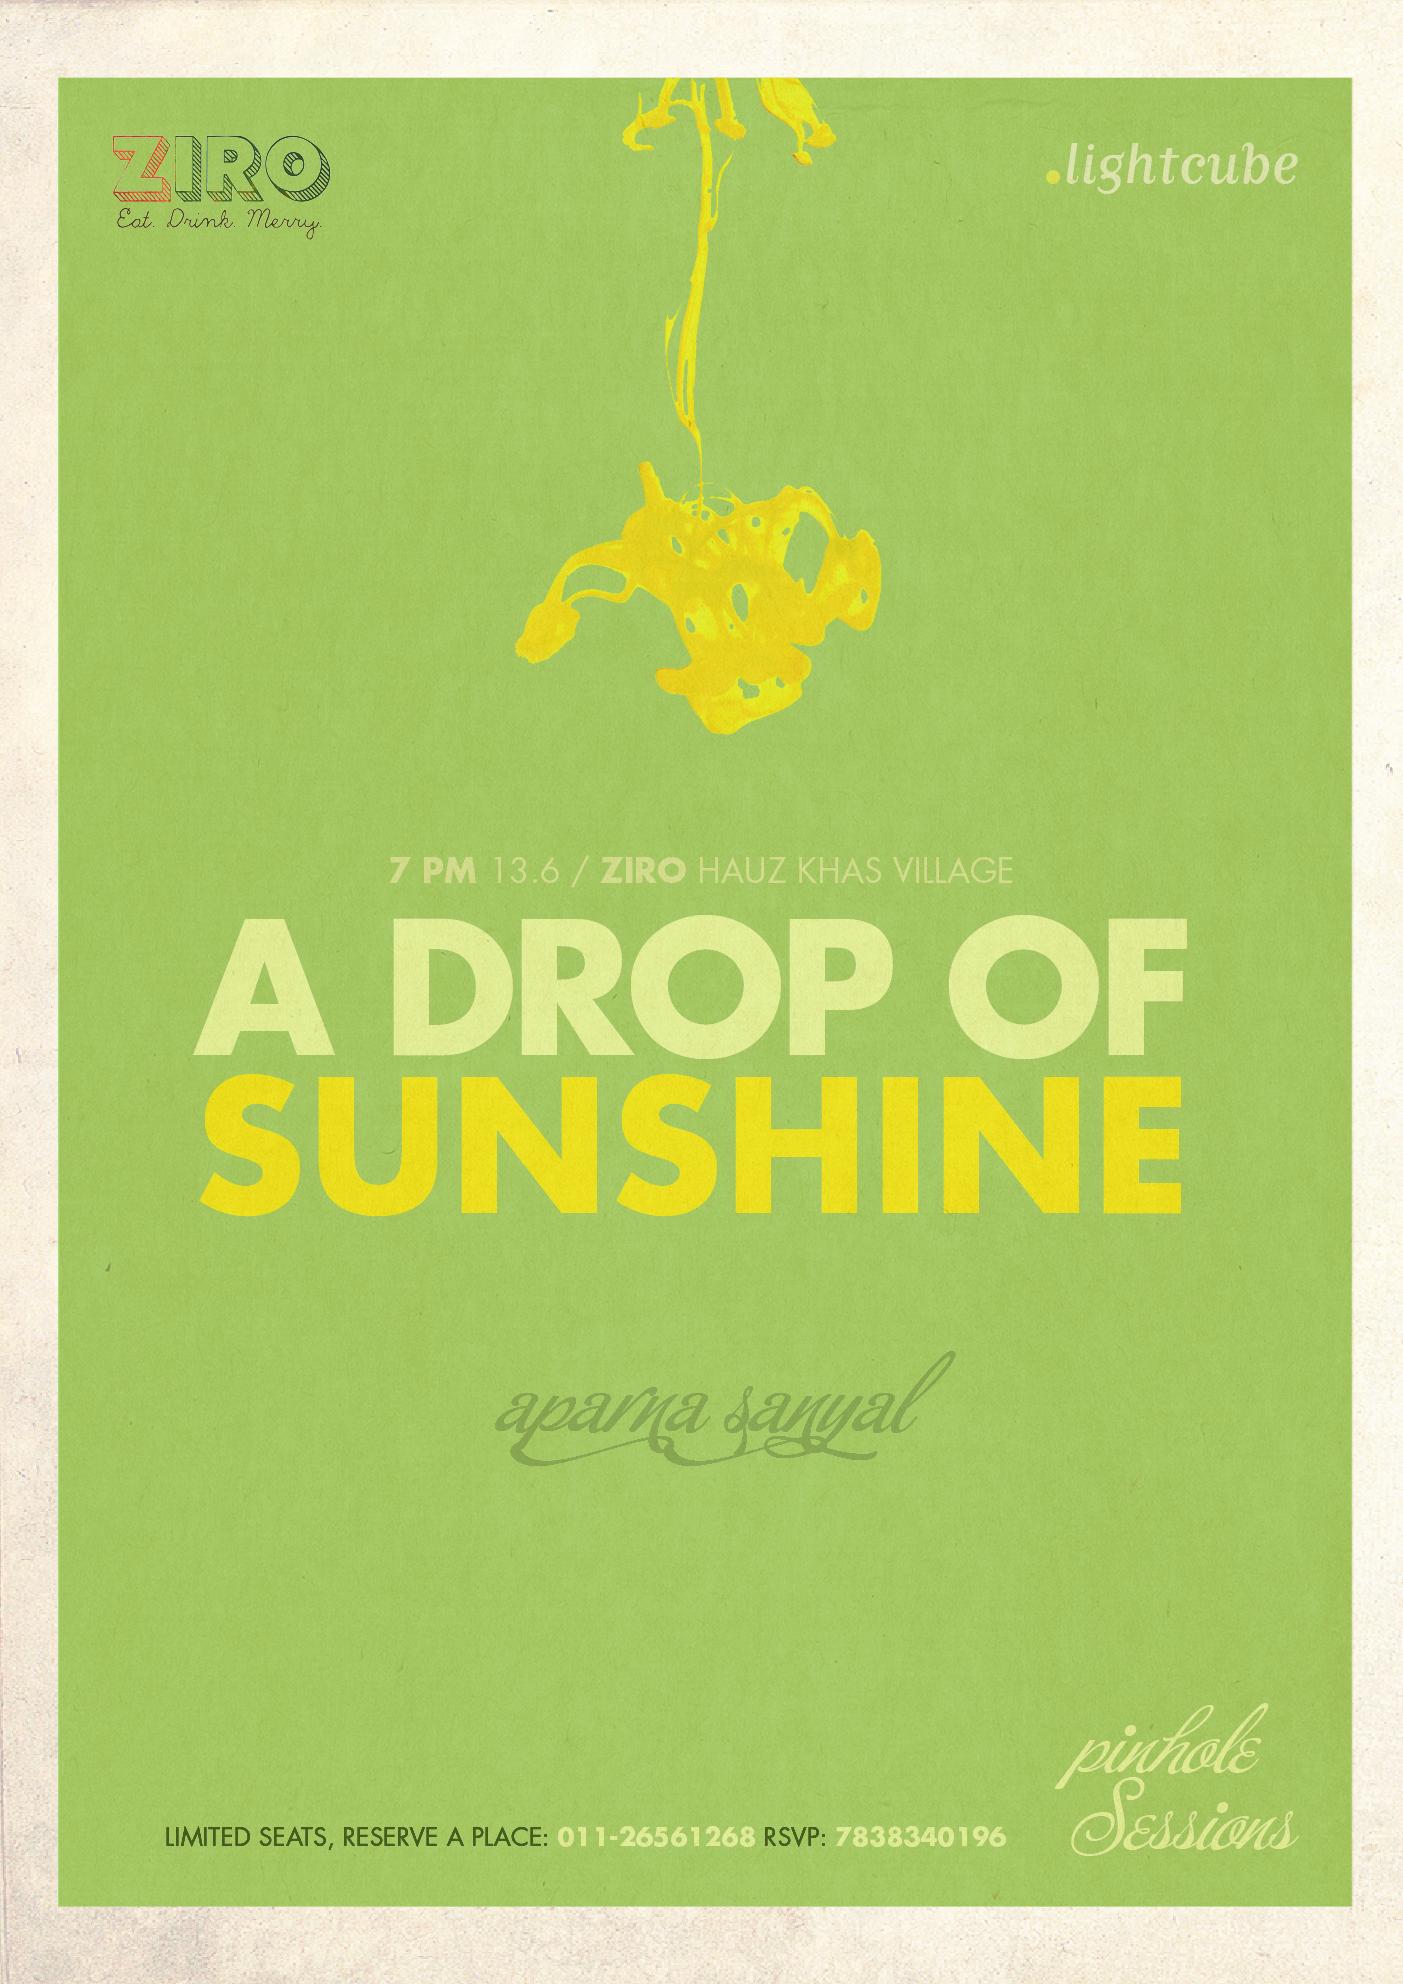 Pinhole Sessions, 13 June 2013, A Drop of Sunshine